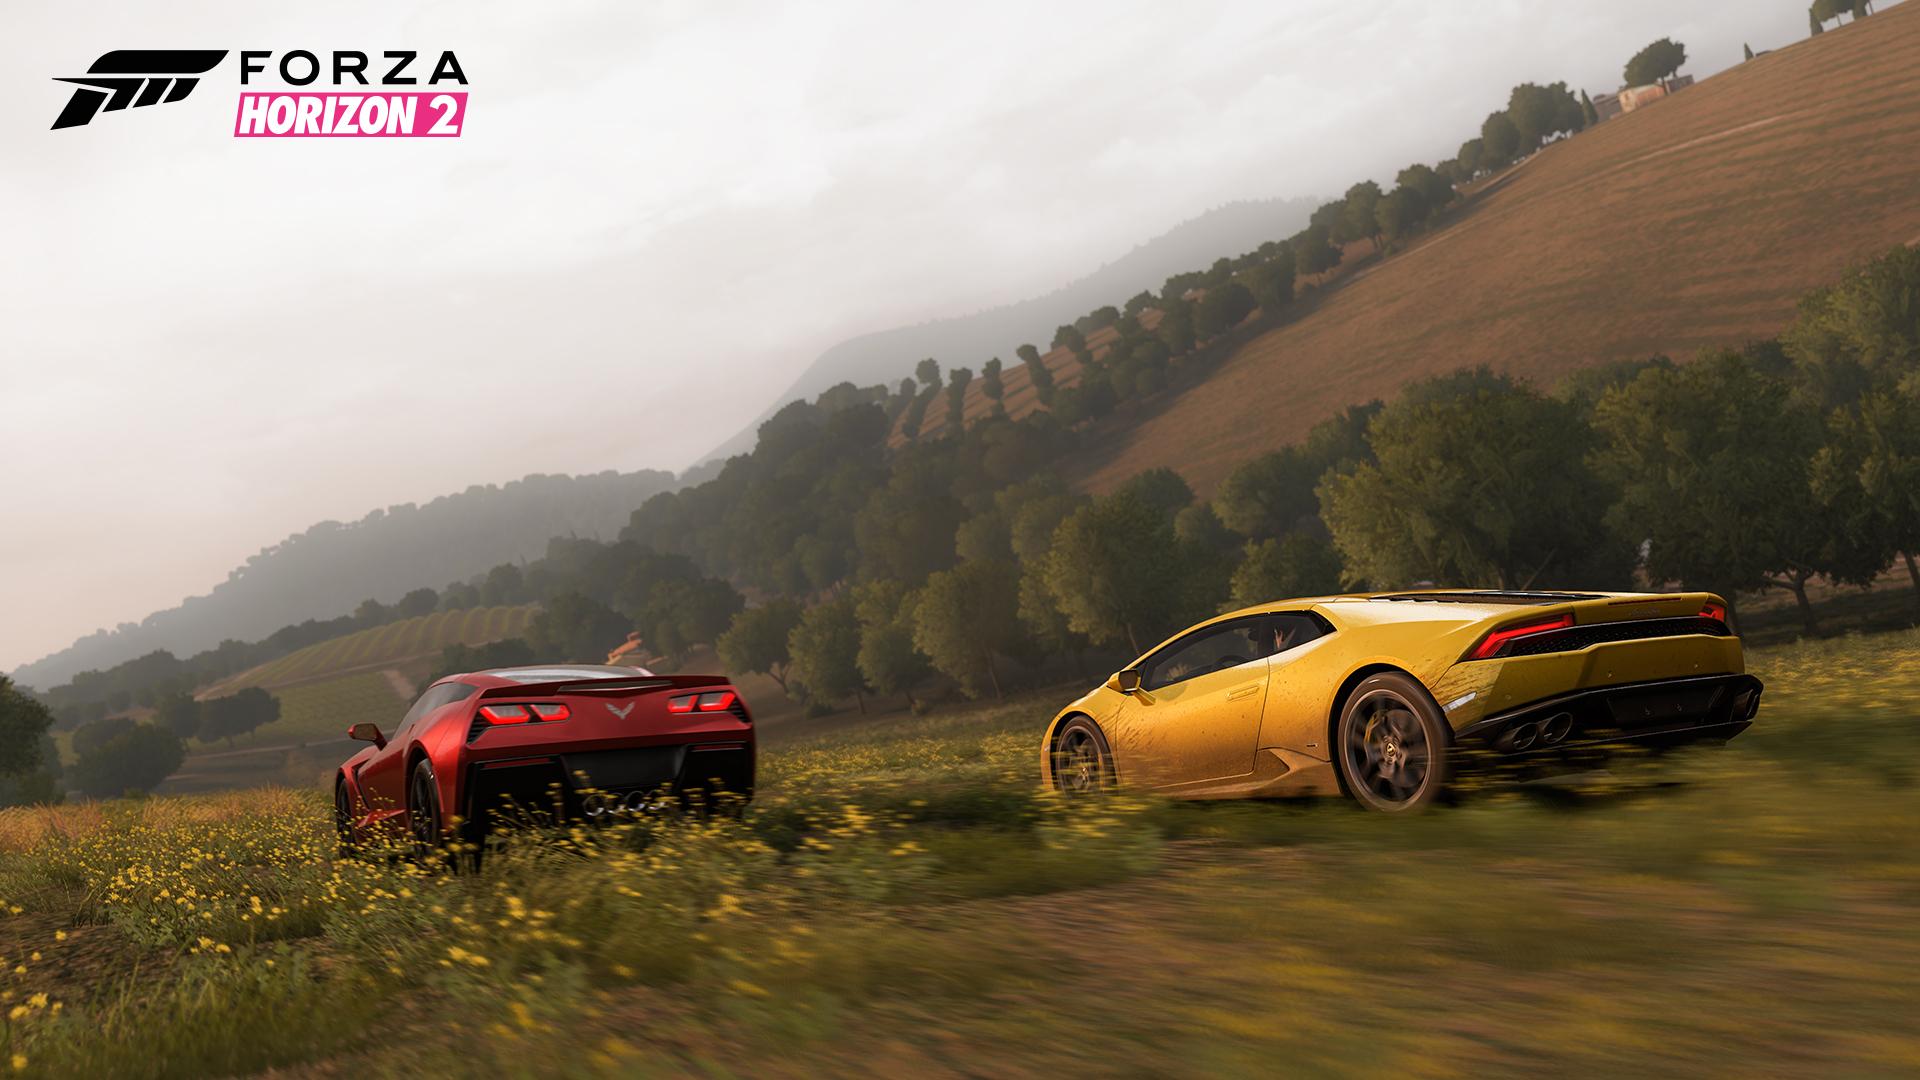 Corvettejpg File   Forza Horizon 2 Wiki Guide   IGN 1920x1080